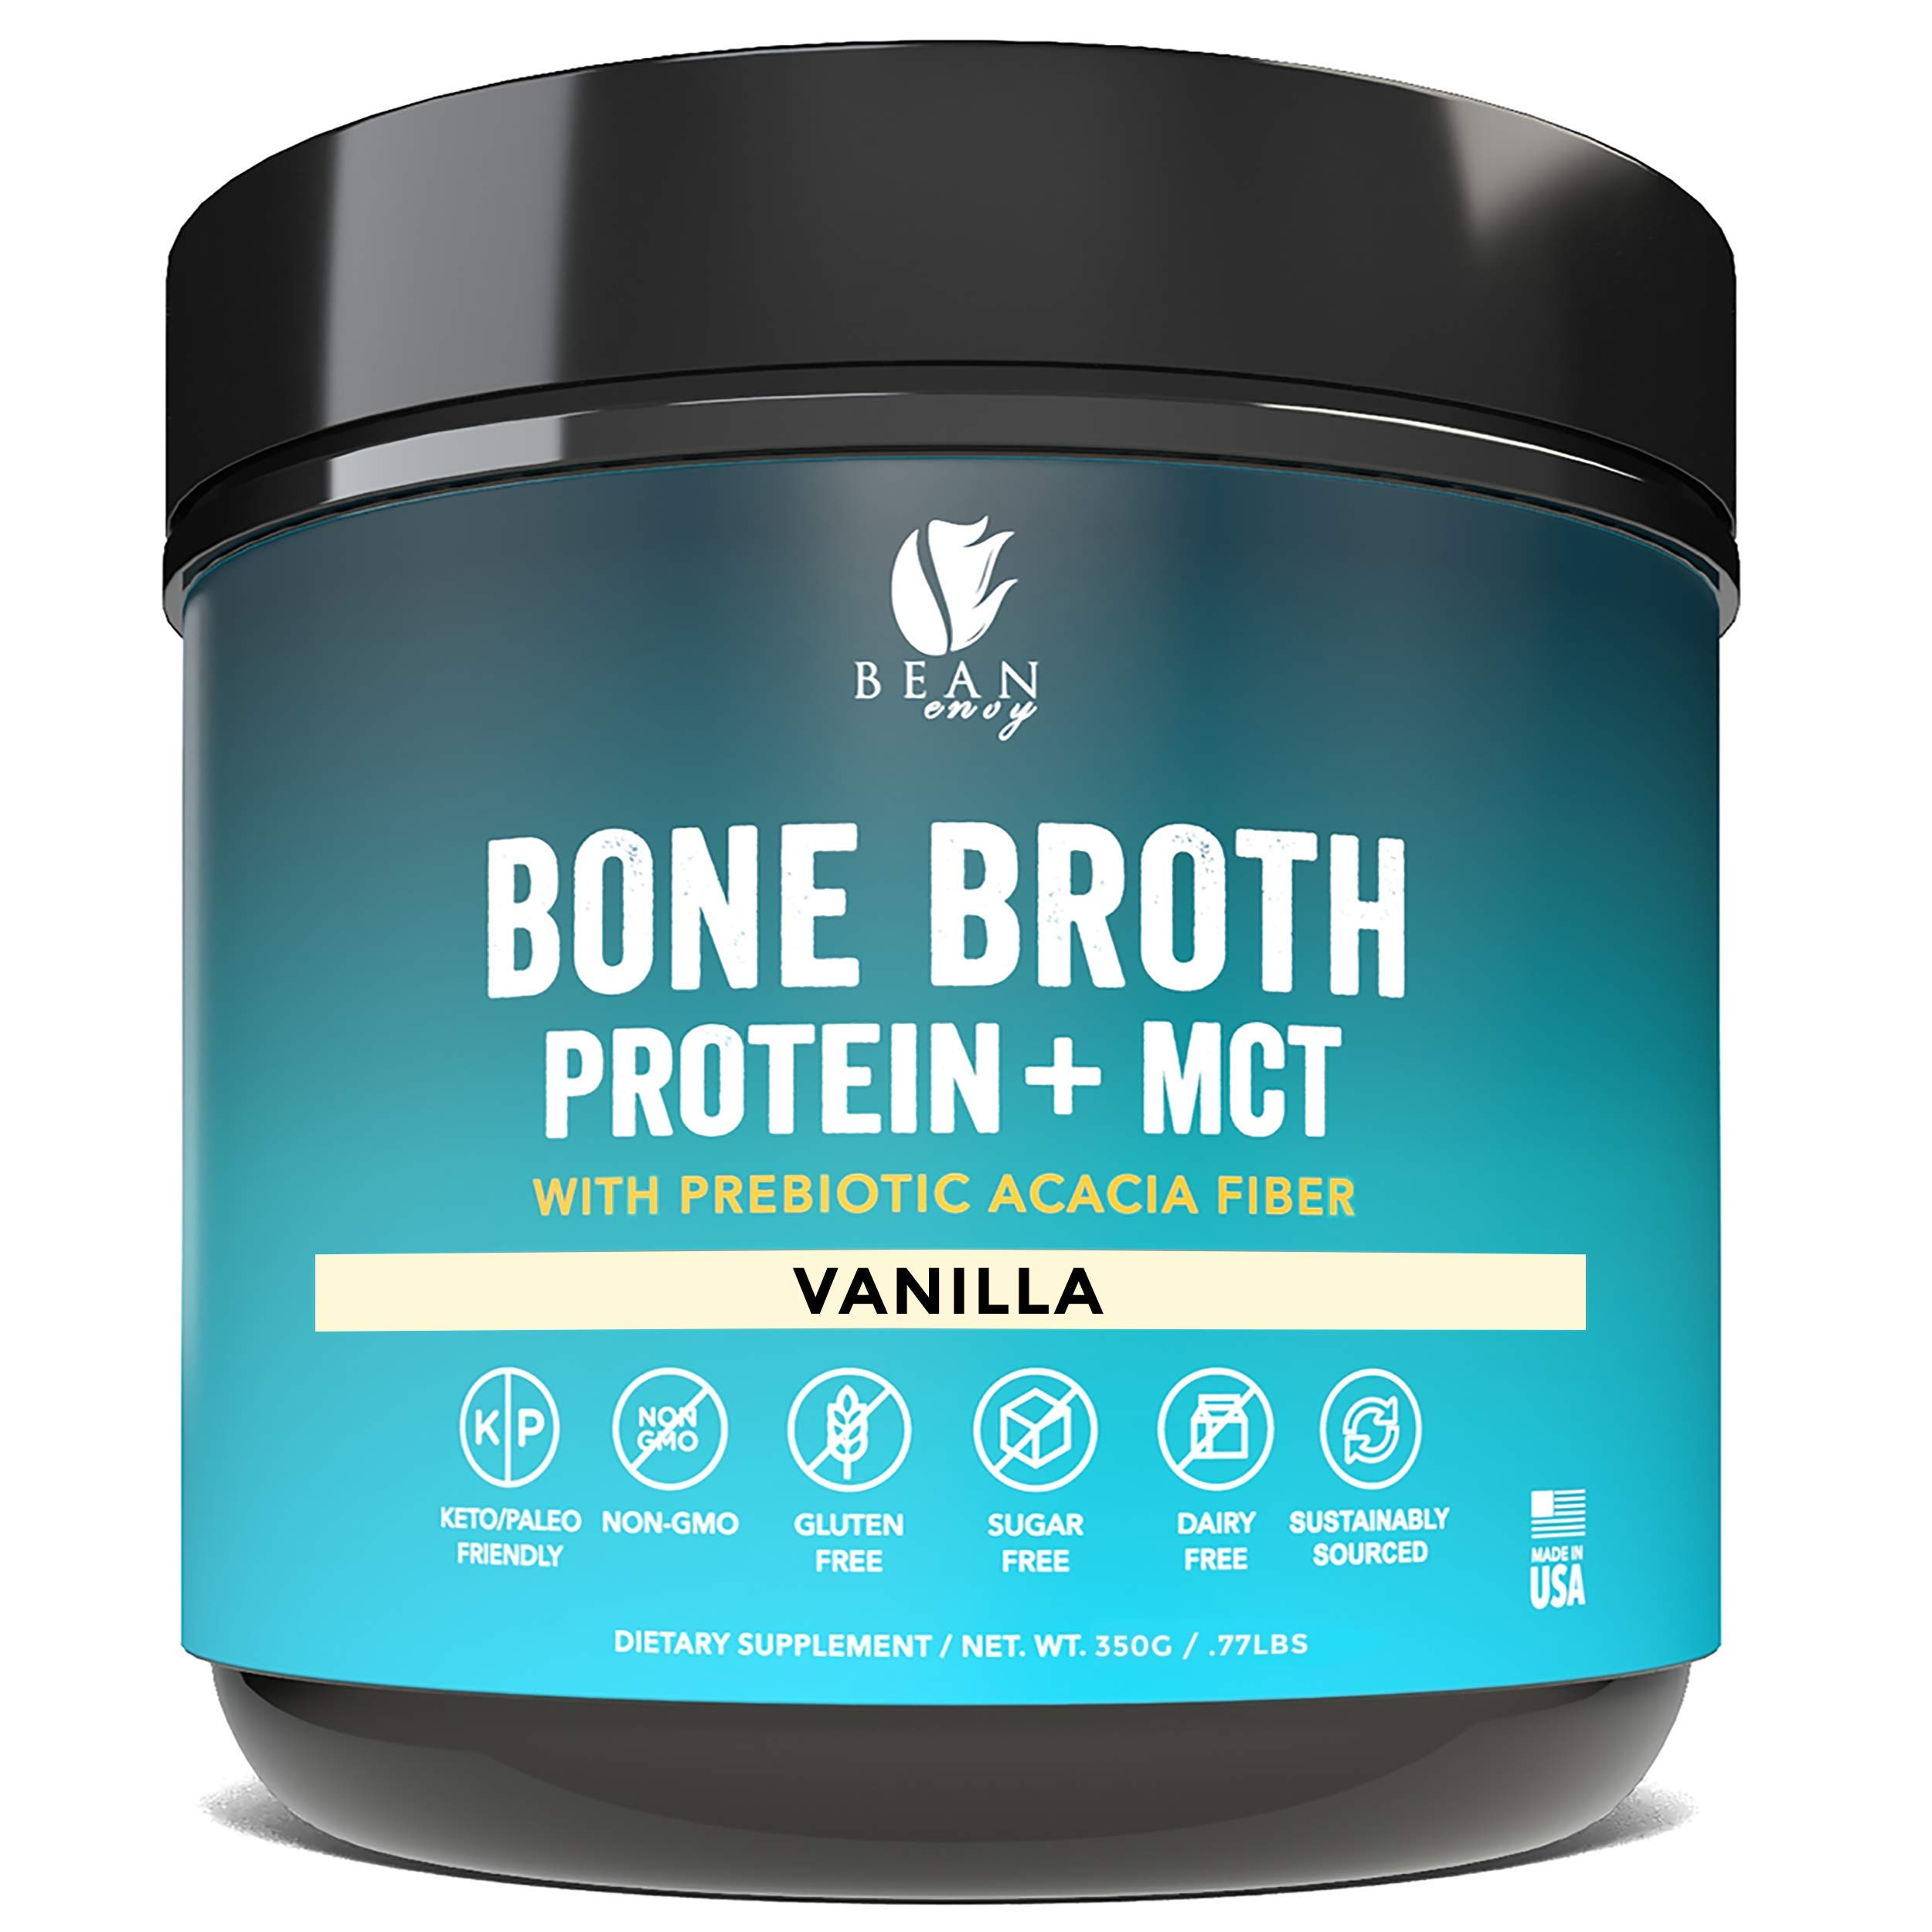 Bean Envy Bone Broth Protein Powder + MCT Oil + Prebiotic Acacia Fiber